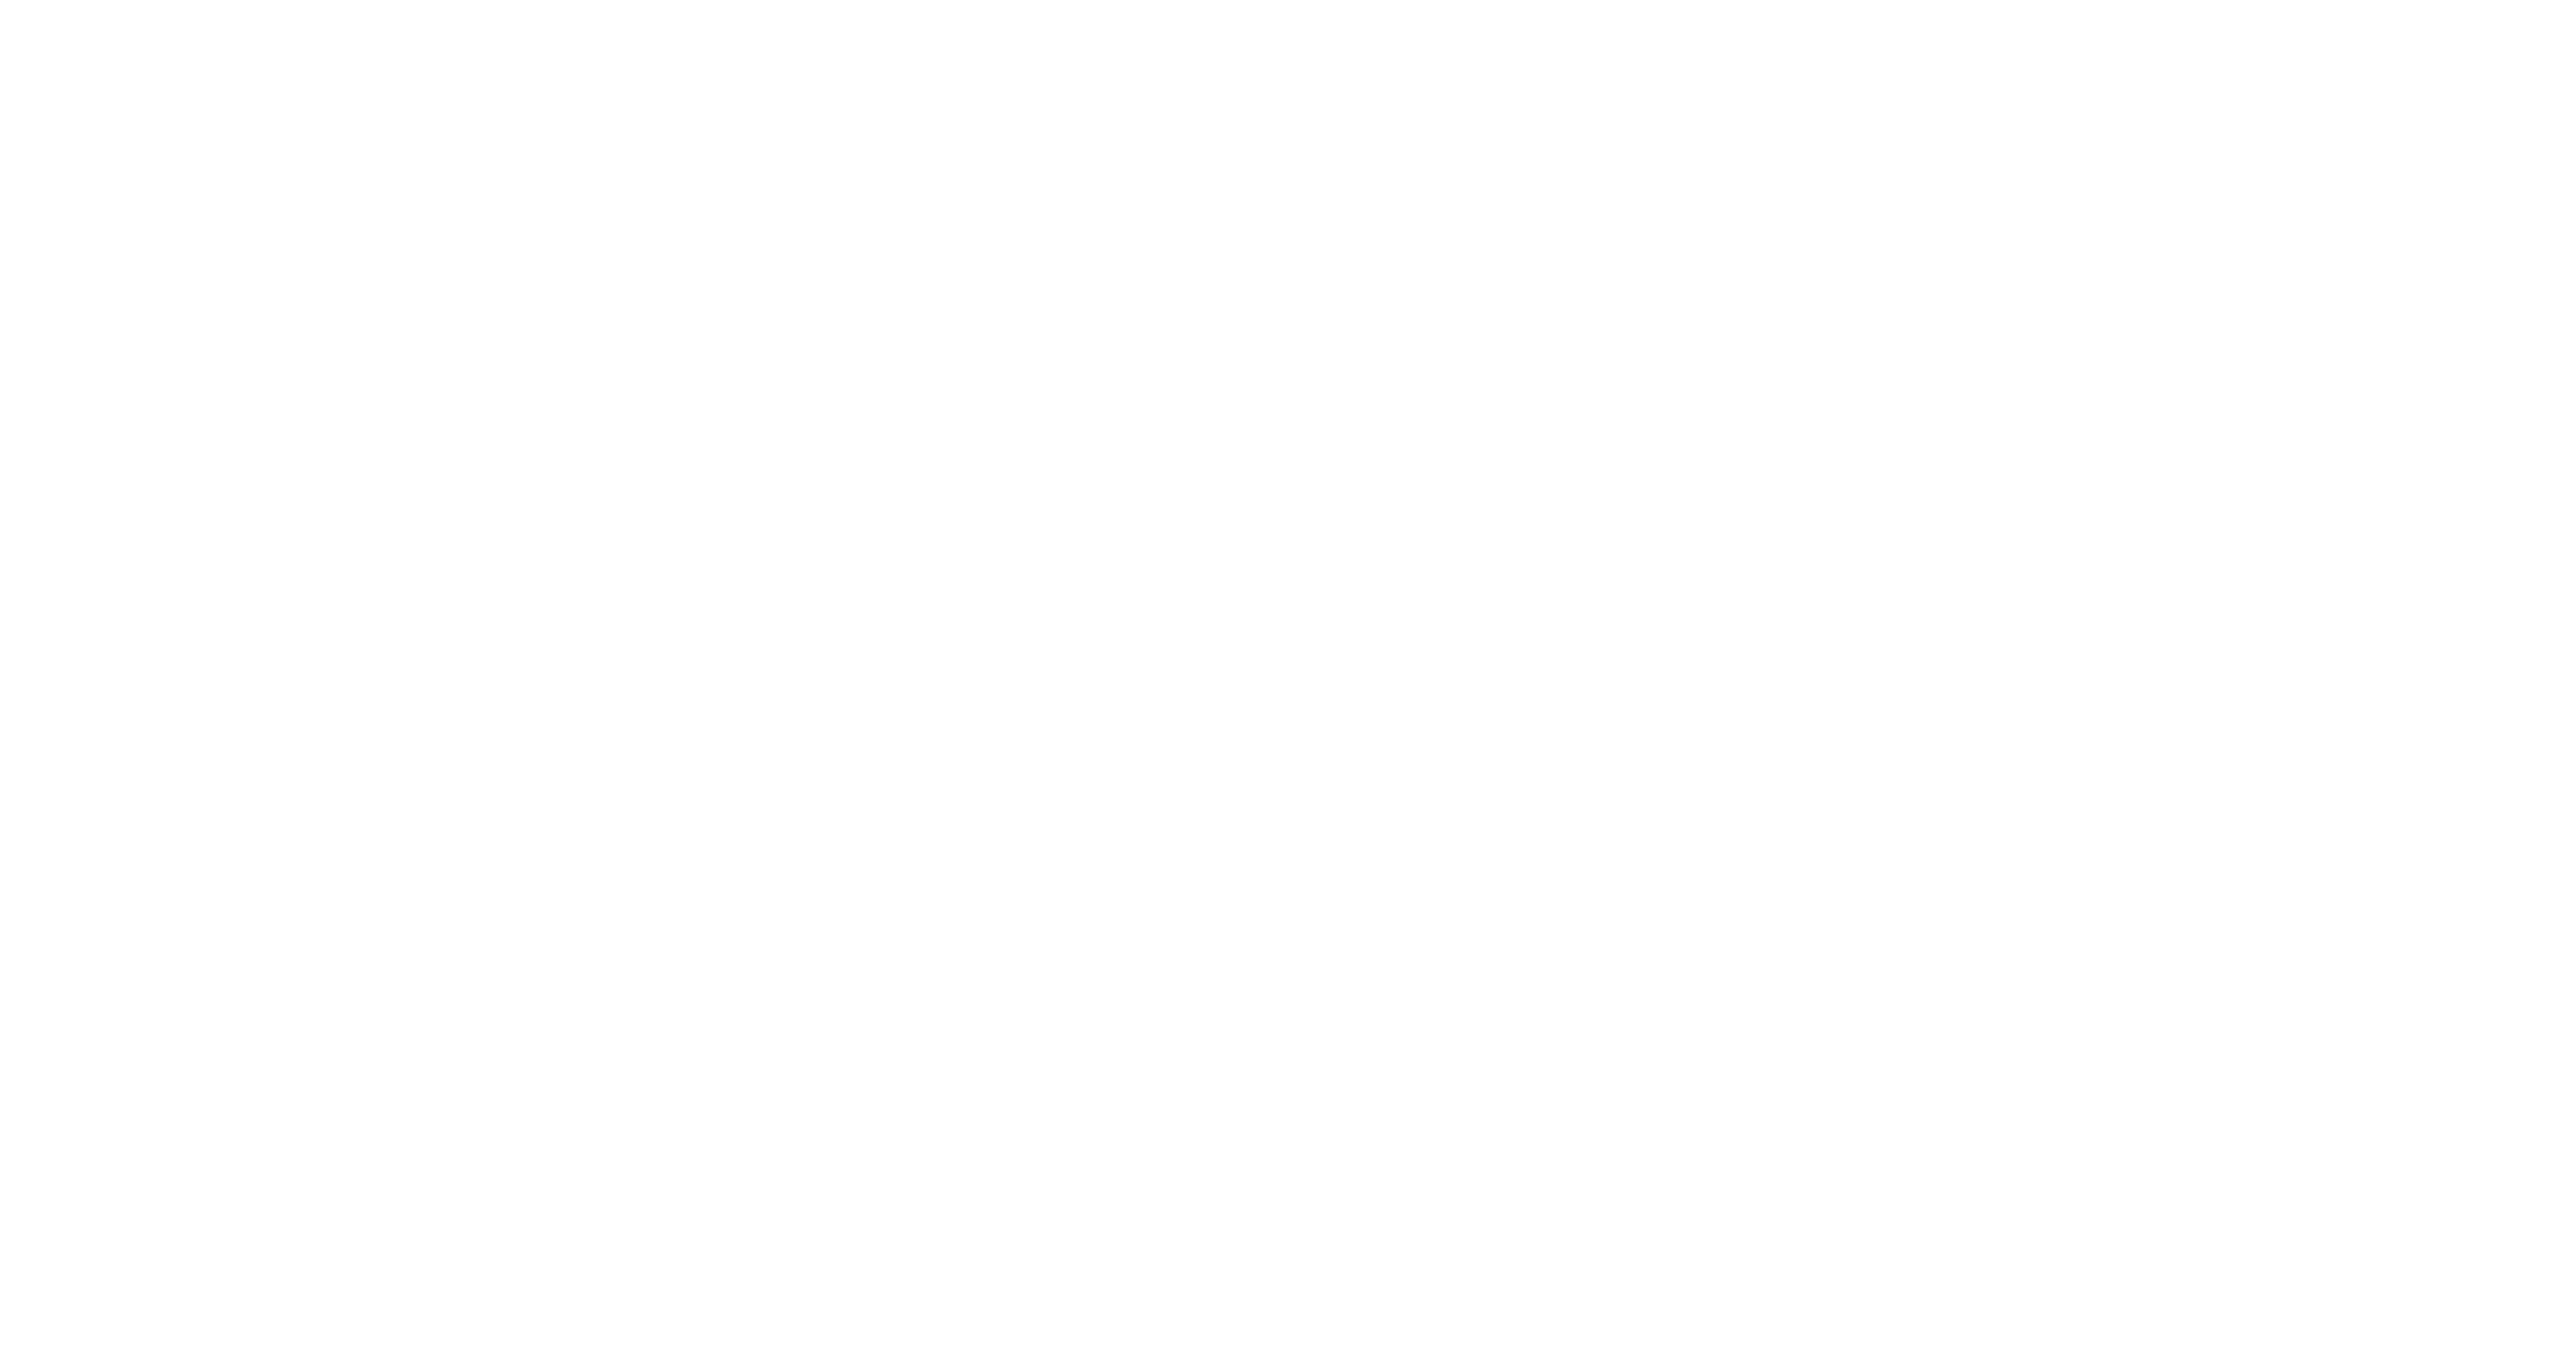 loyly-24